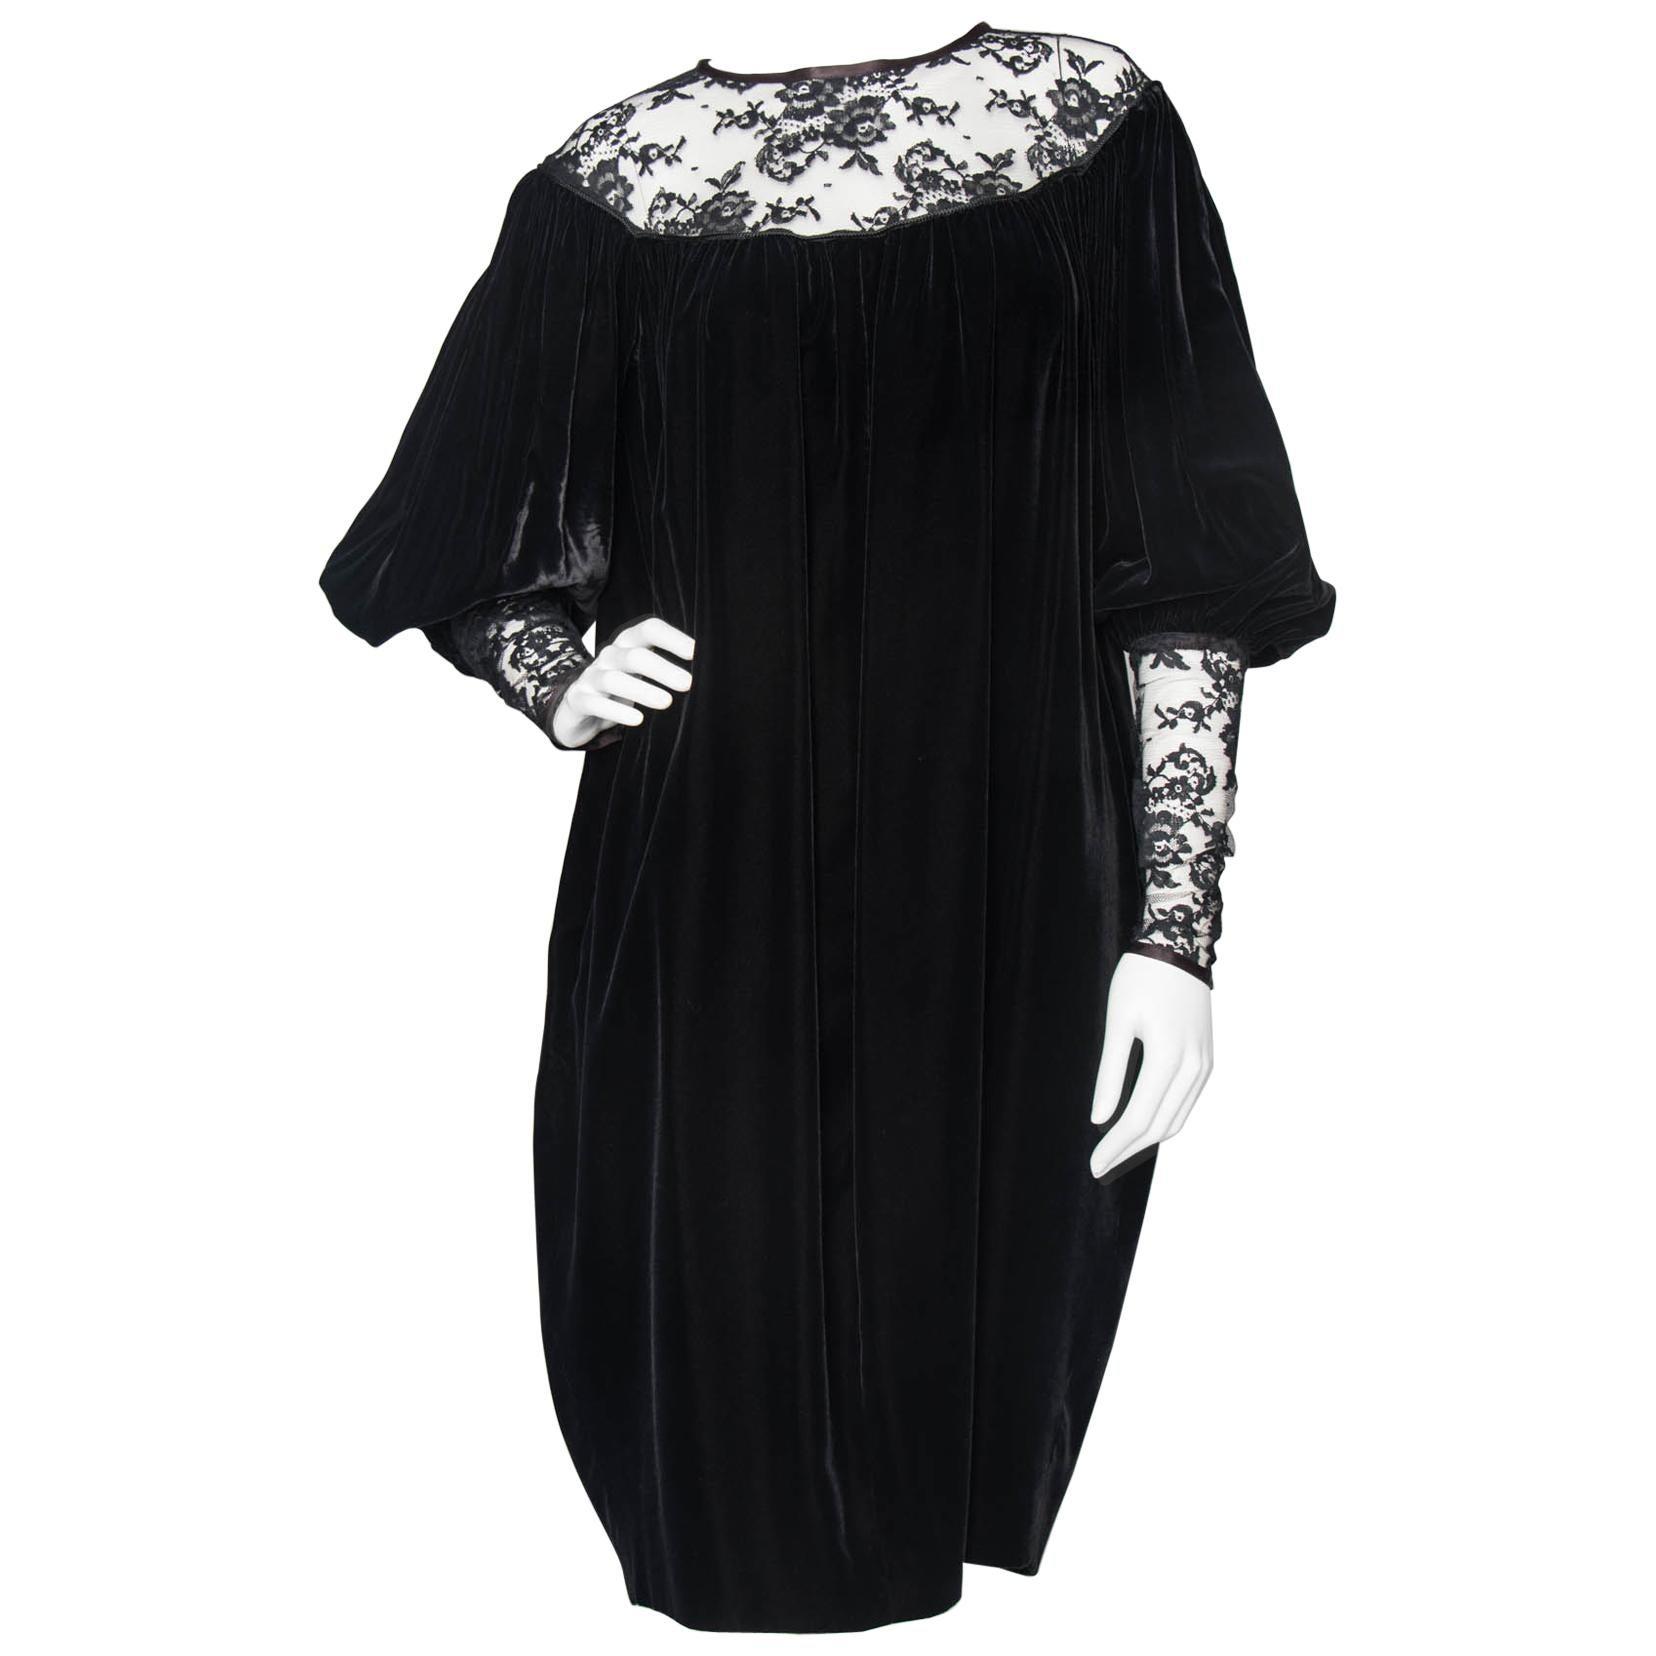 b36e964d724 Yves Saint Laurent Rive Gauche vintage Black Velvet Dress With Lace Detail  at 1stdibs